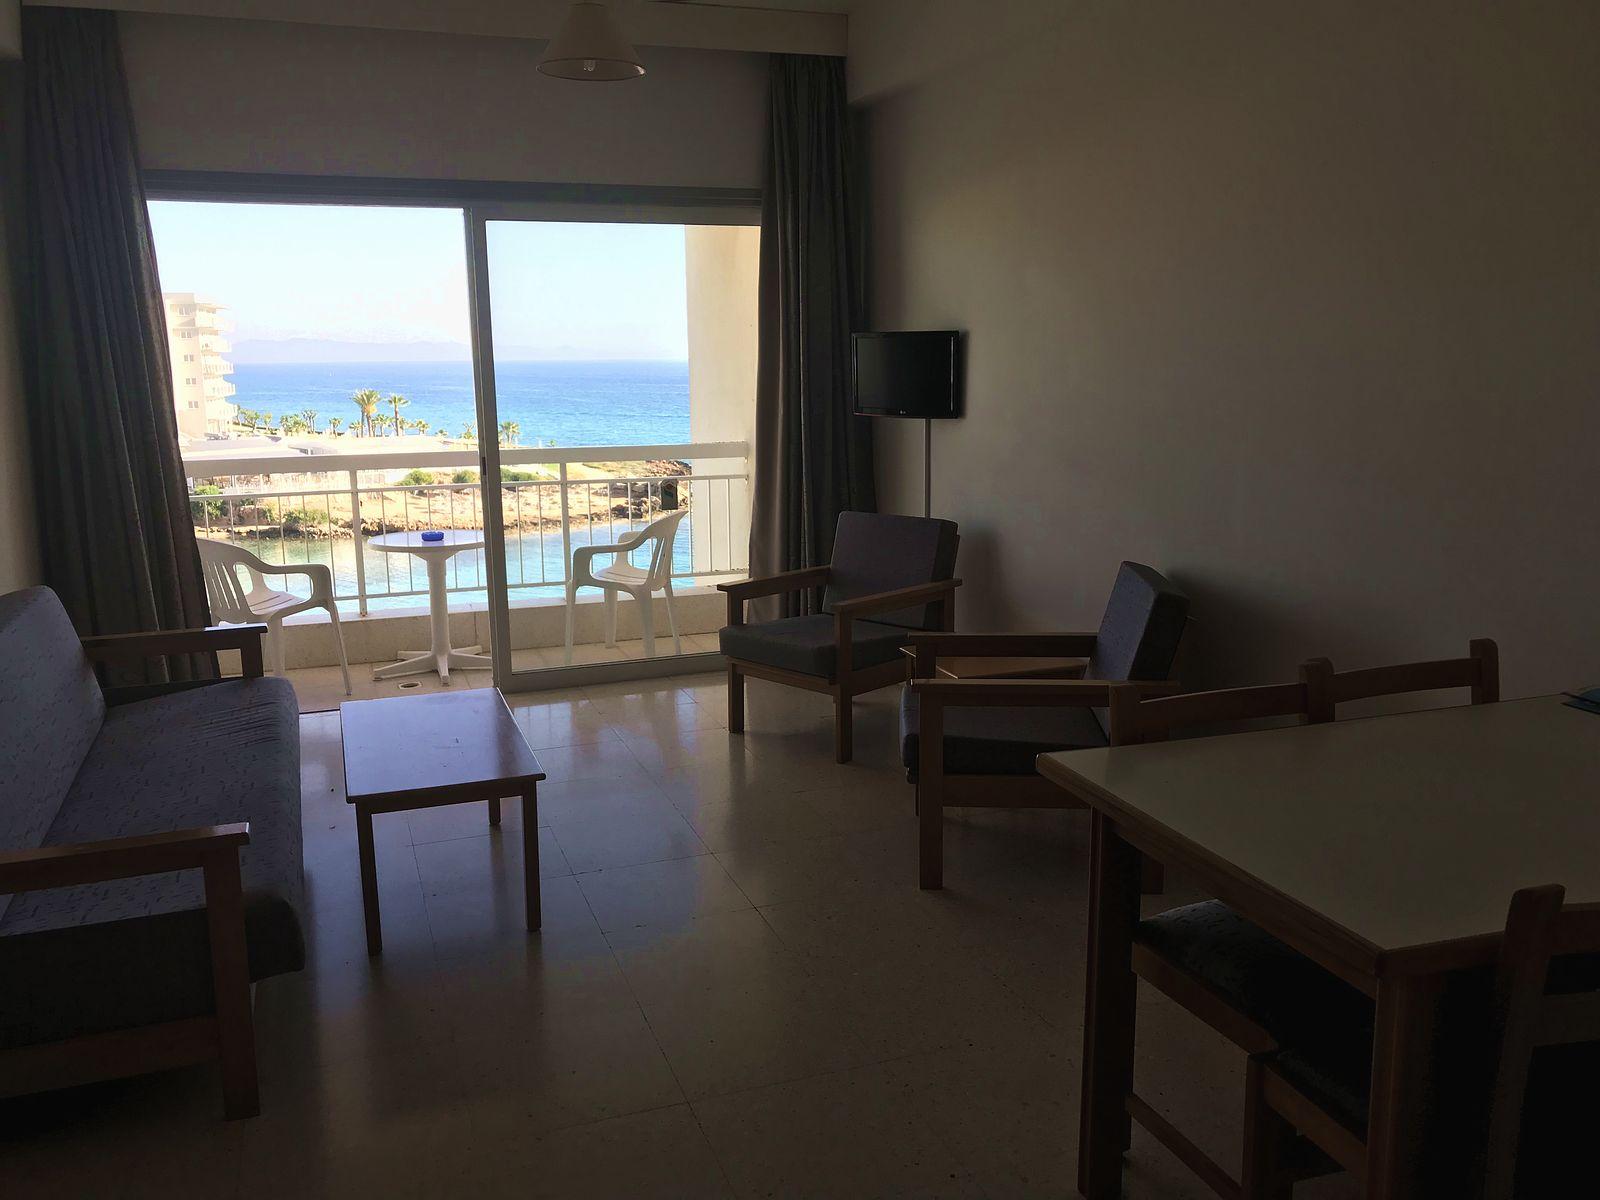 Cyprus. Hotel Pola Costa room view.